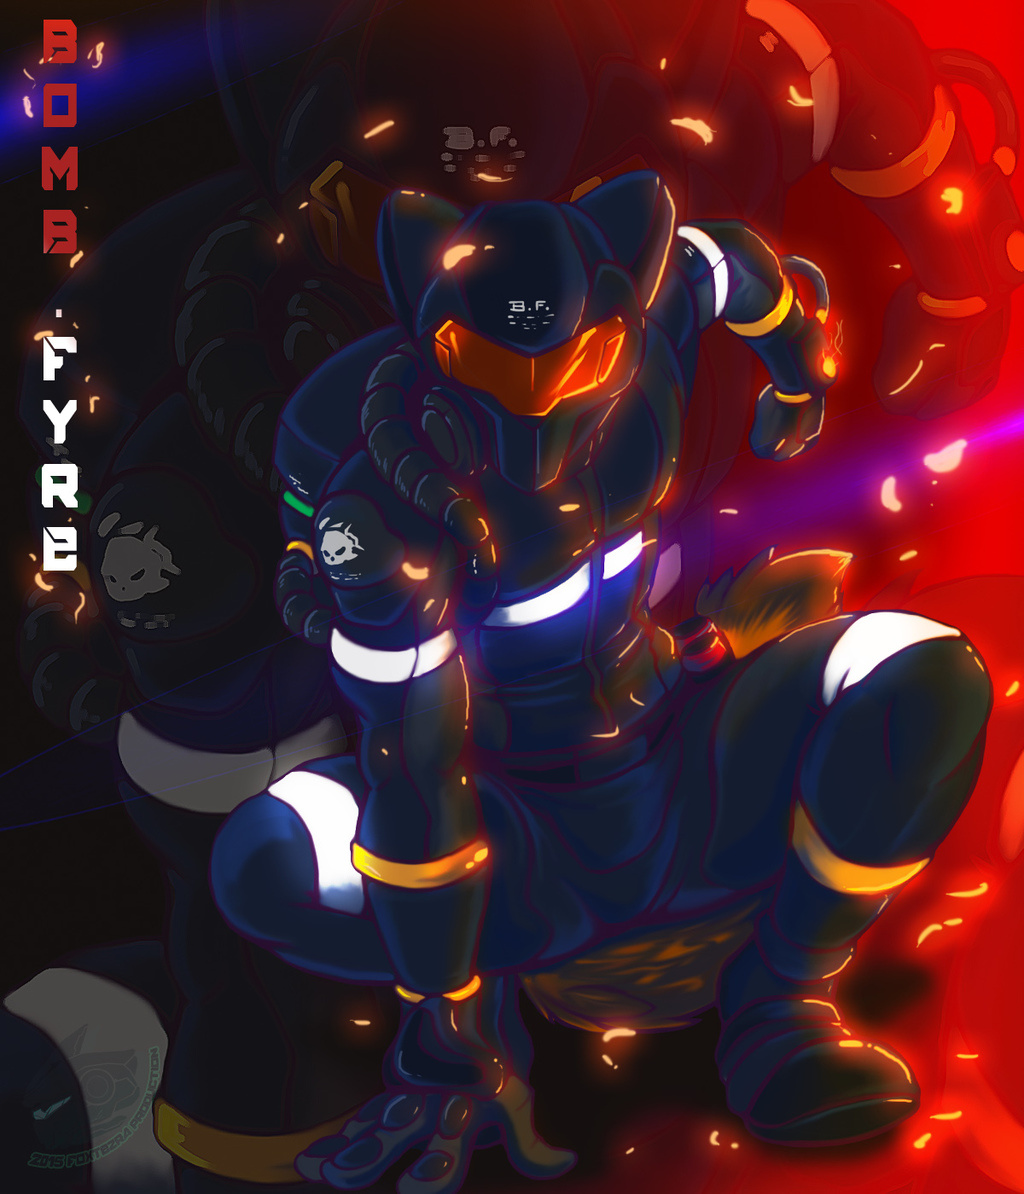 Bomb Fyre! (Commission Art)